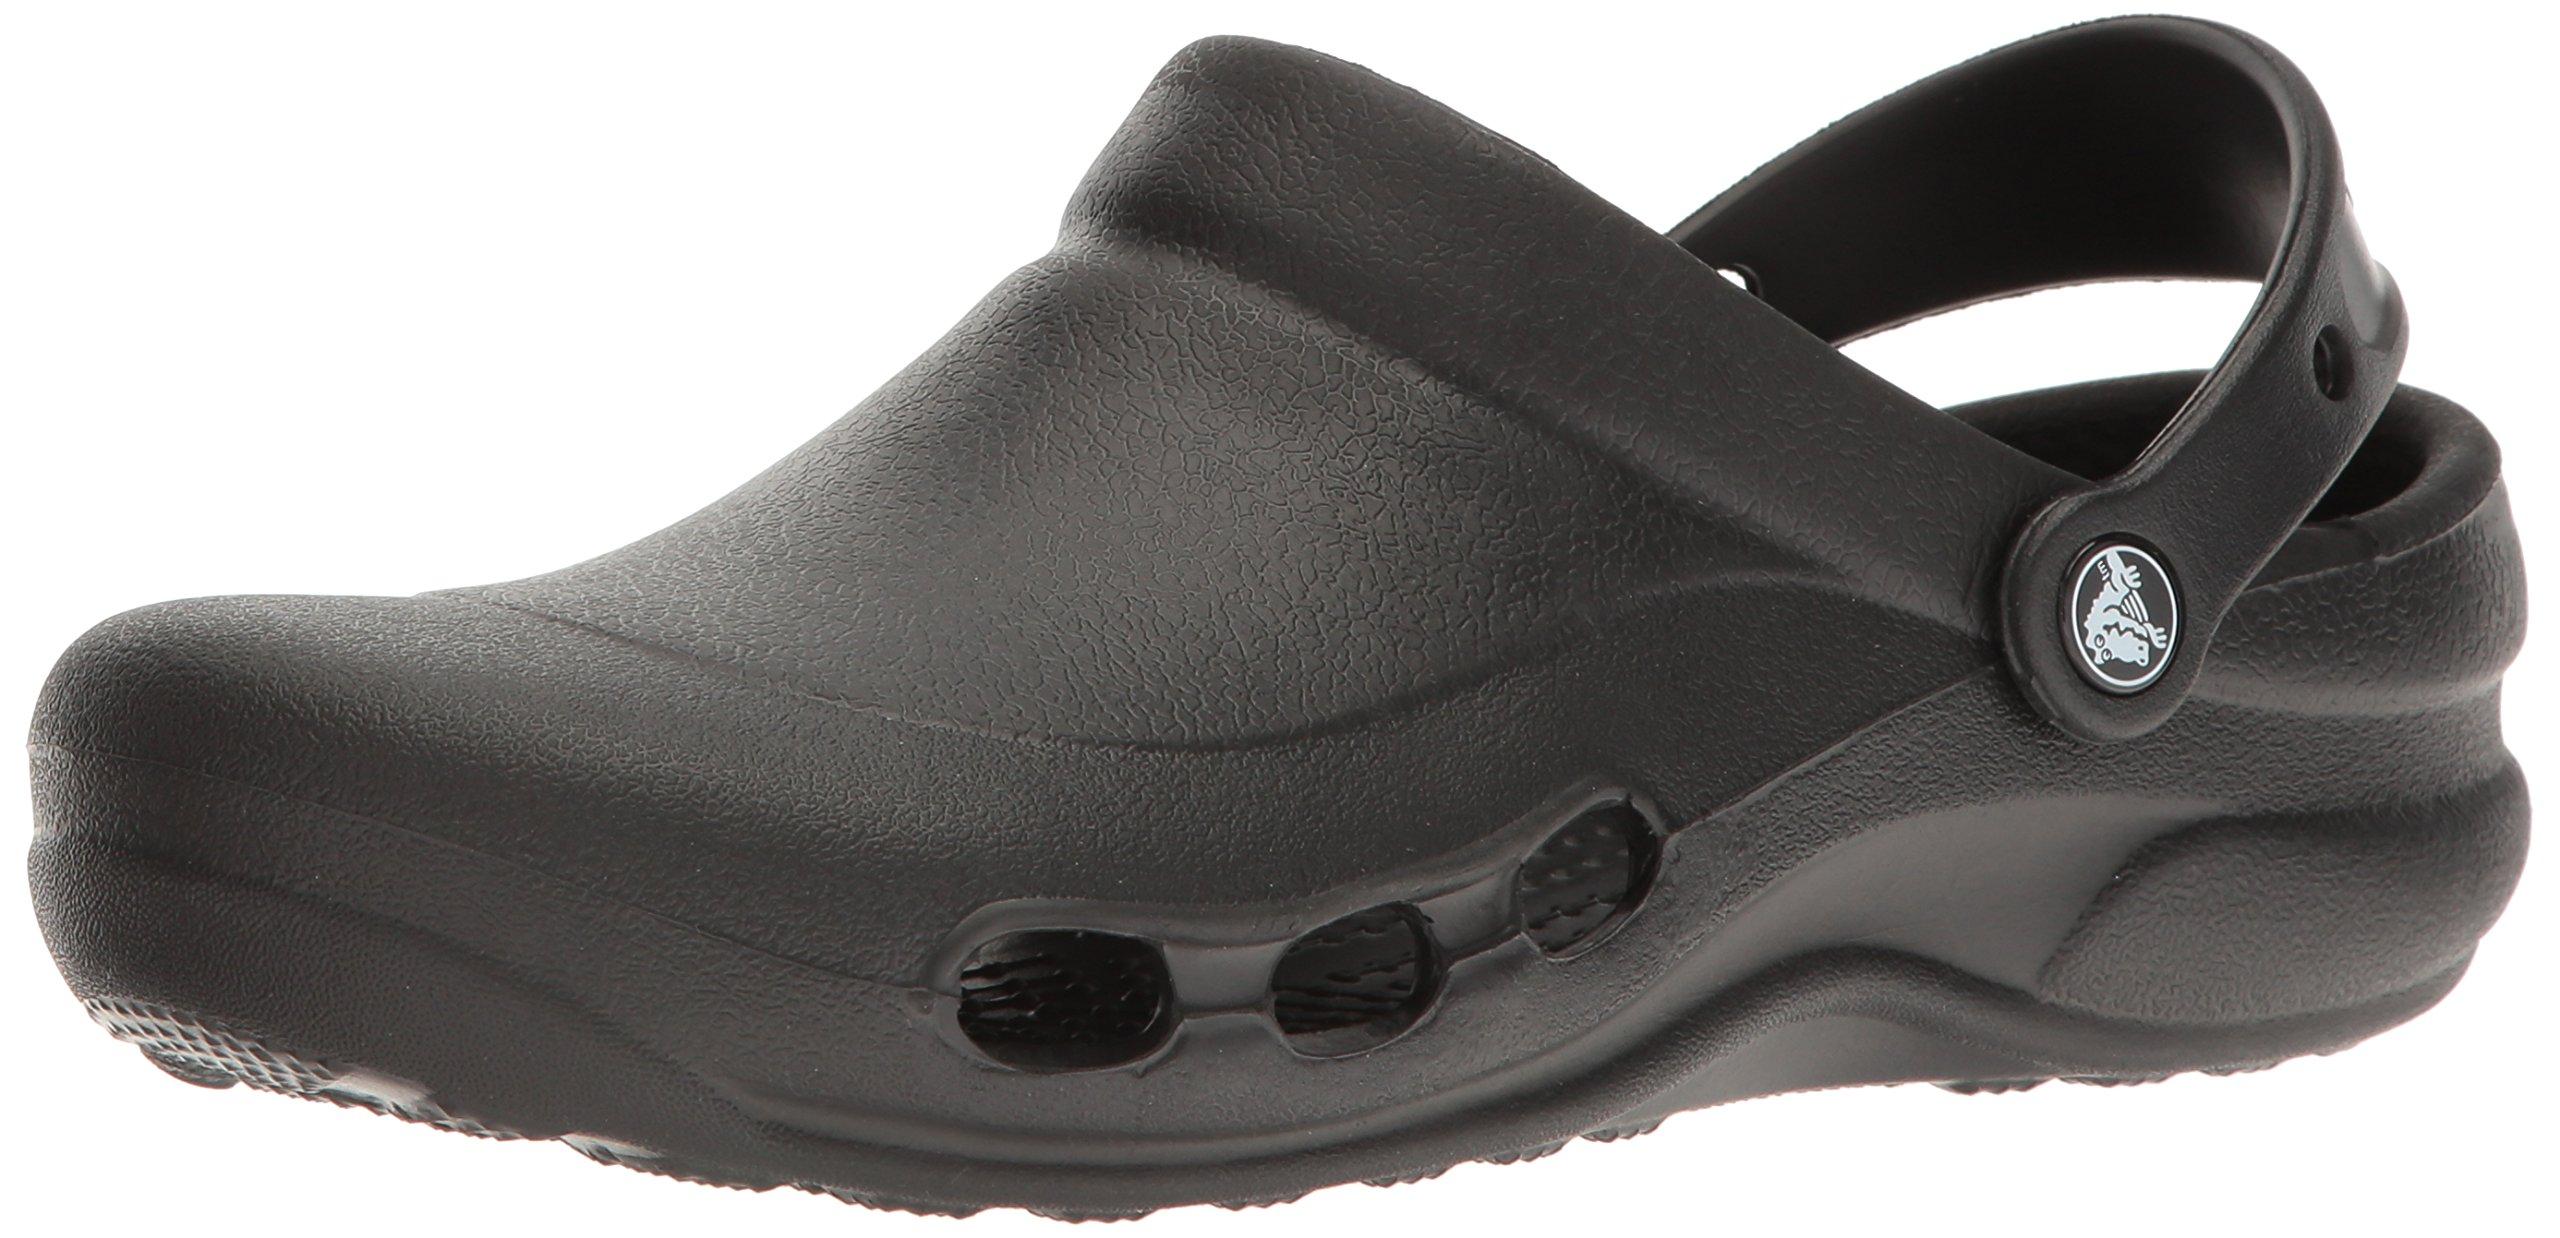 Crocs Unisex Adults/' Specialist Ii Clog